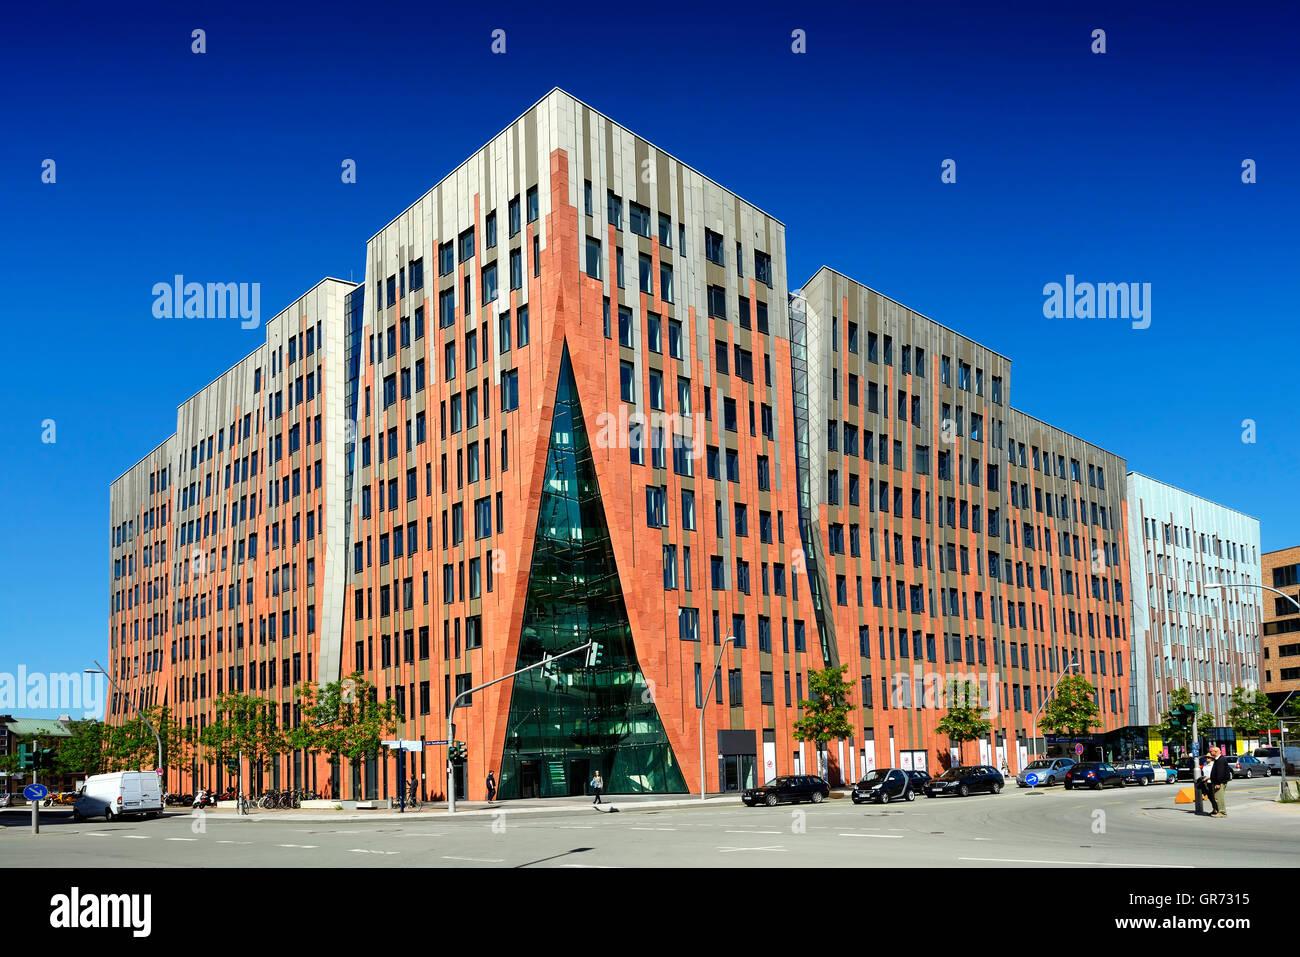 Sumatra Kontor, Modern Office Building In Hamburg, Germany - Stock Image